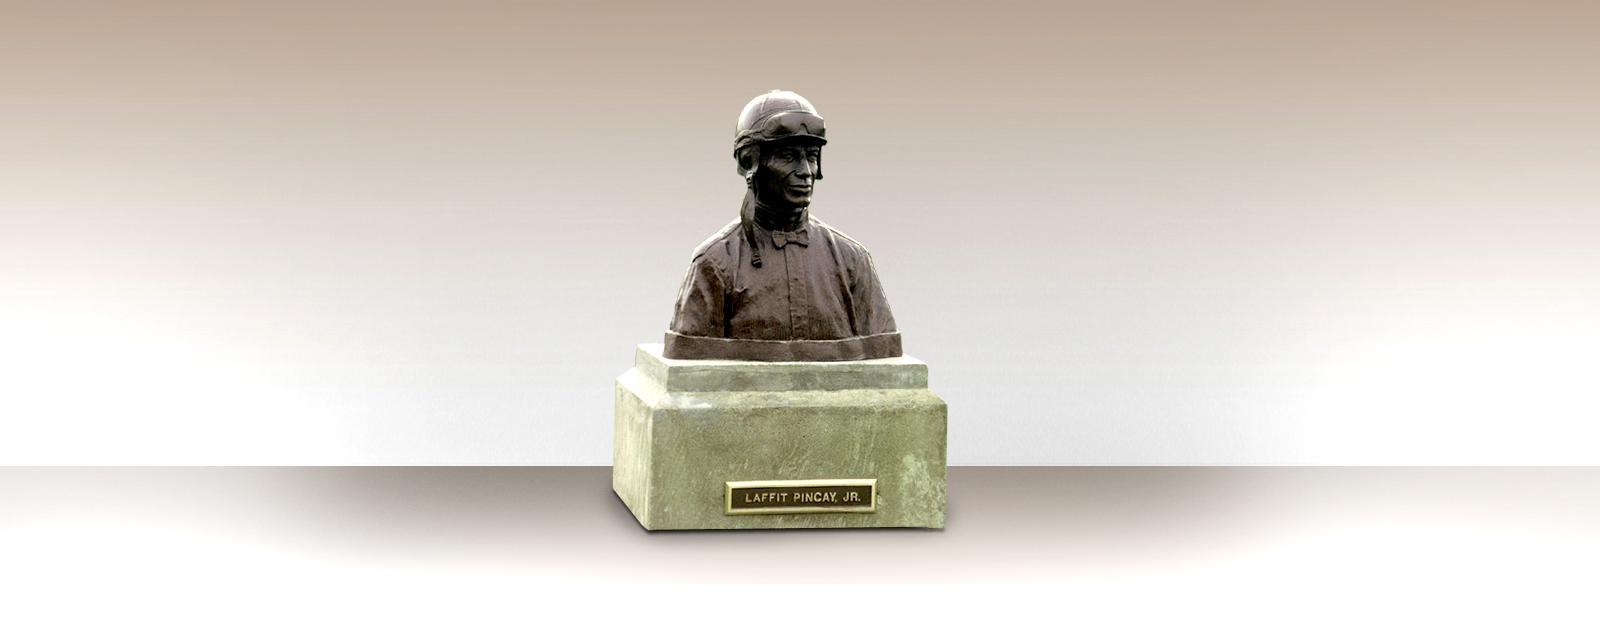 jockey-statue-bronze-sculpture-laffit-pincay